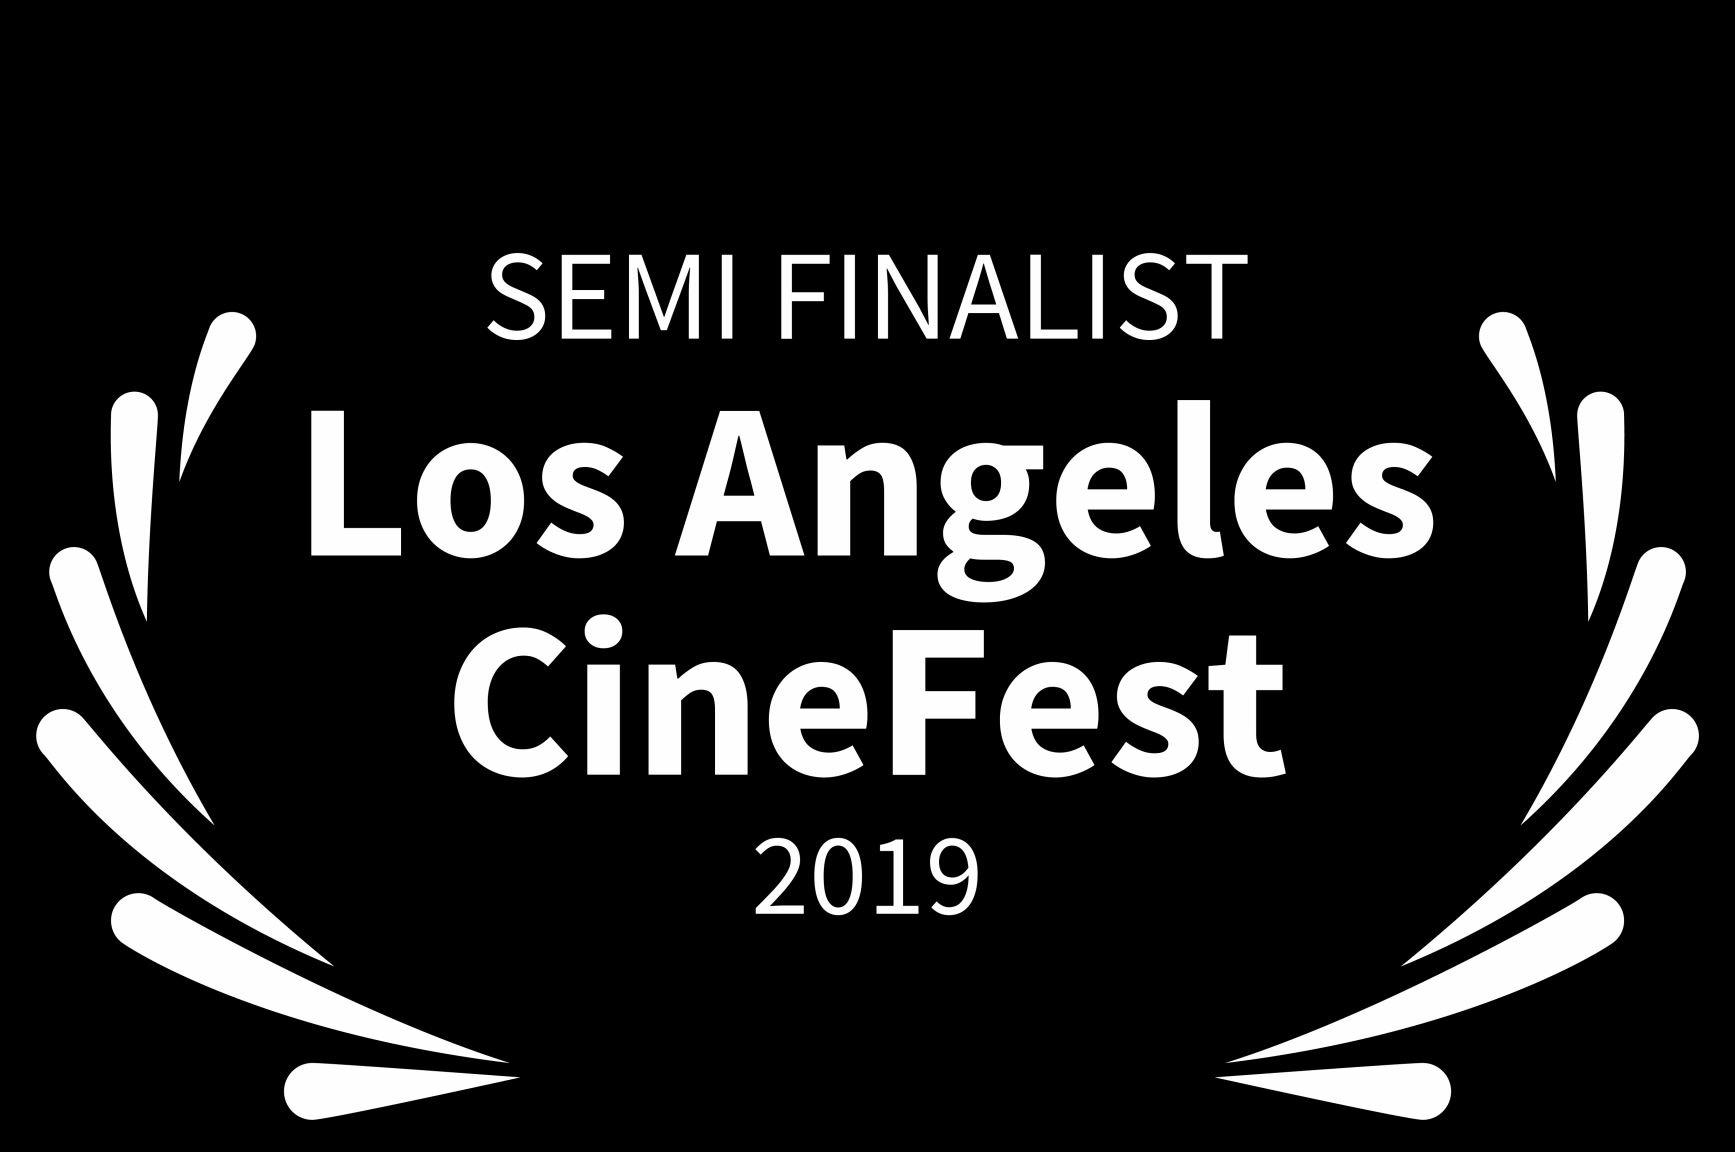 LA CineFest Semi finalist